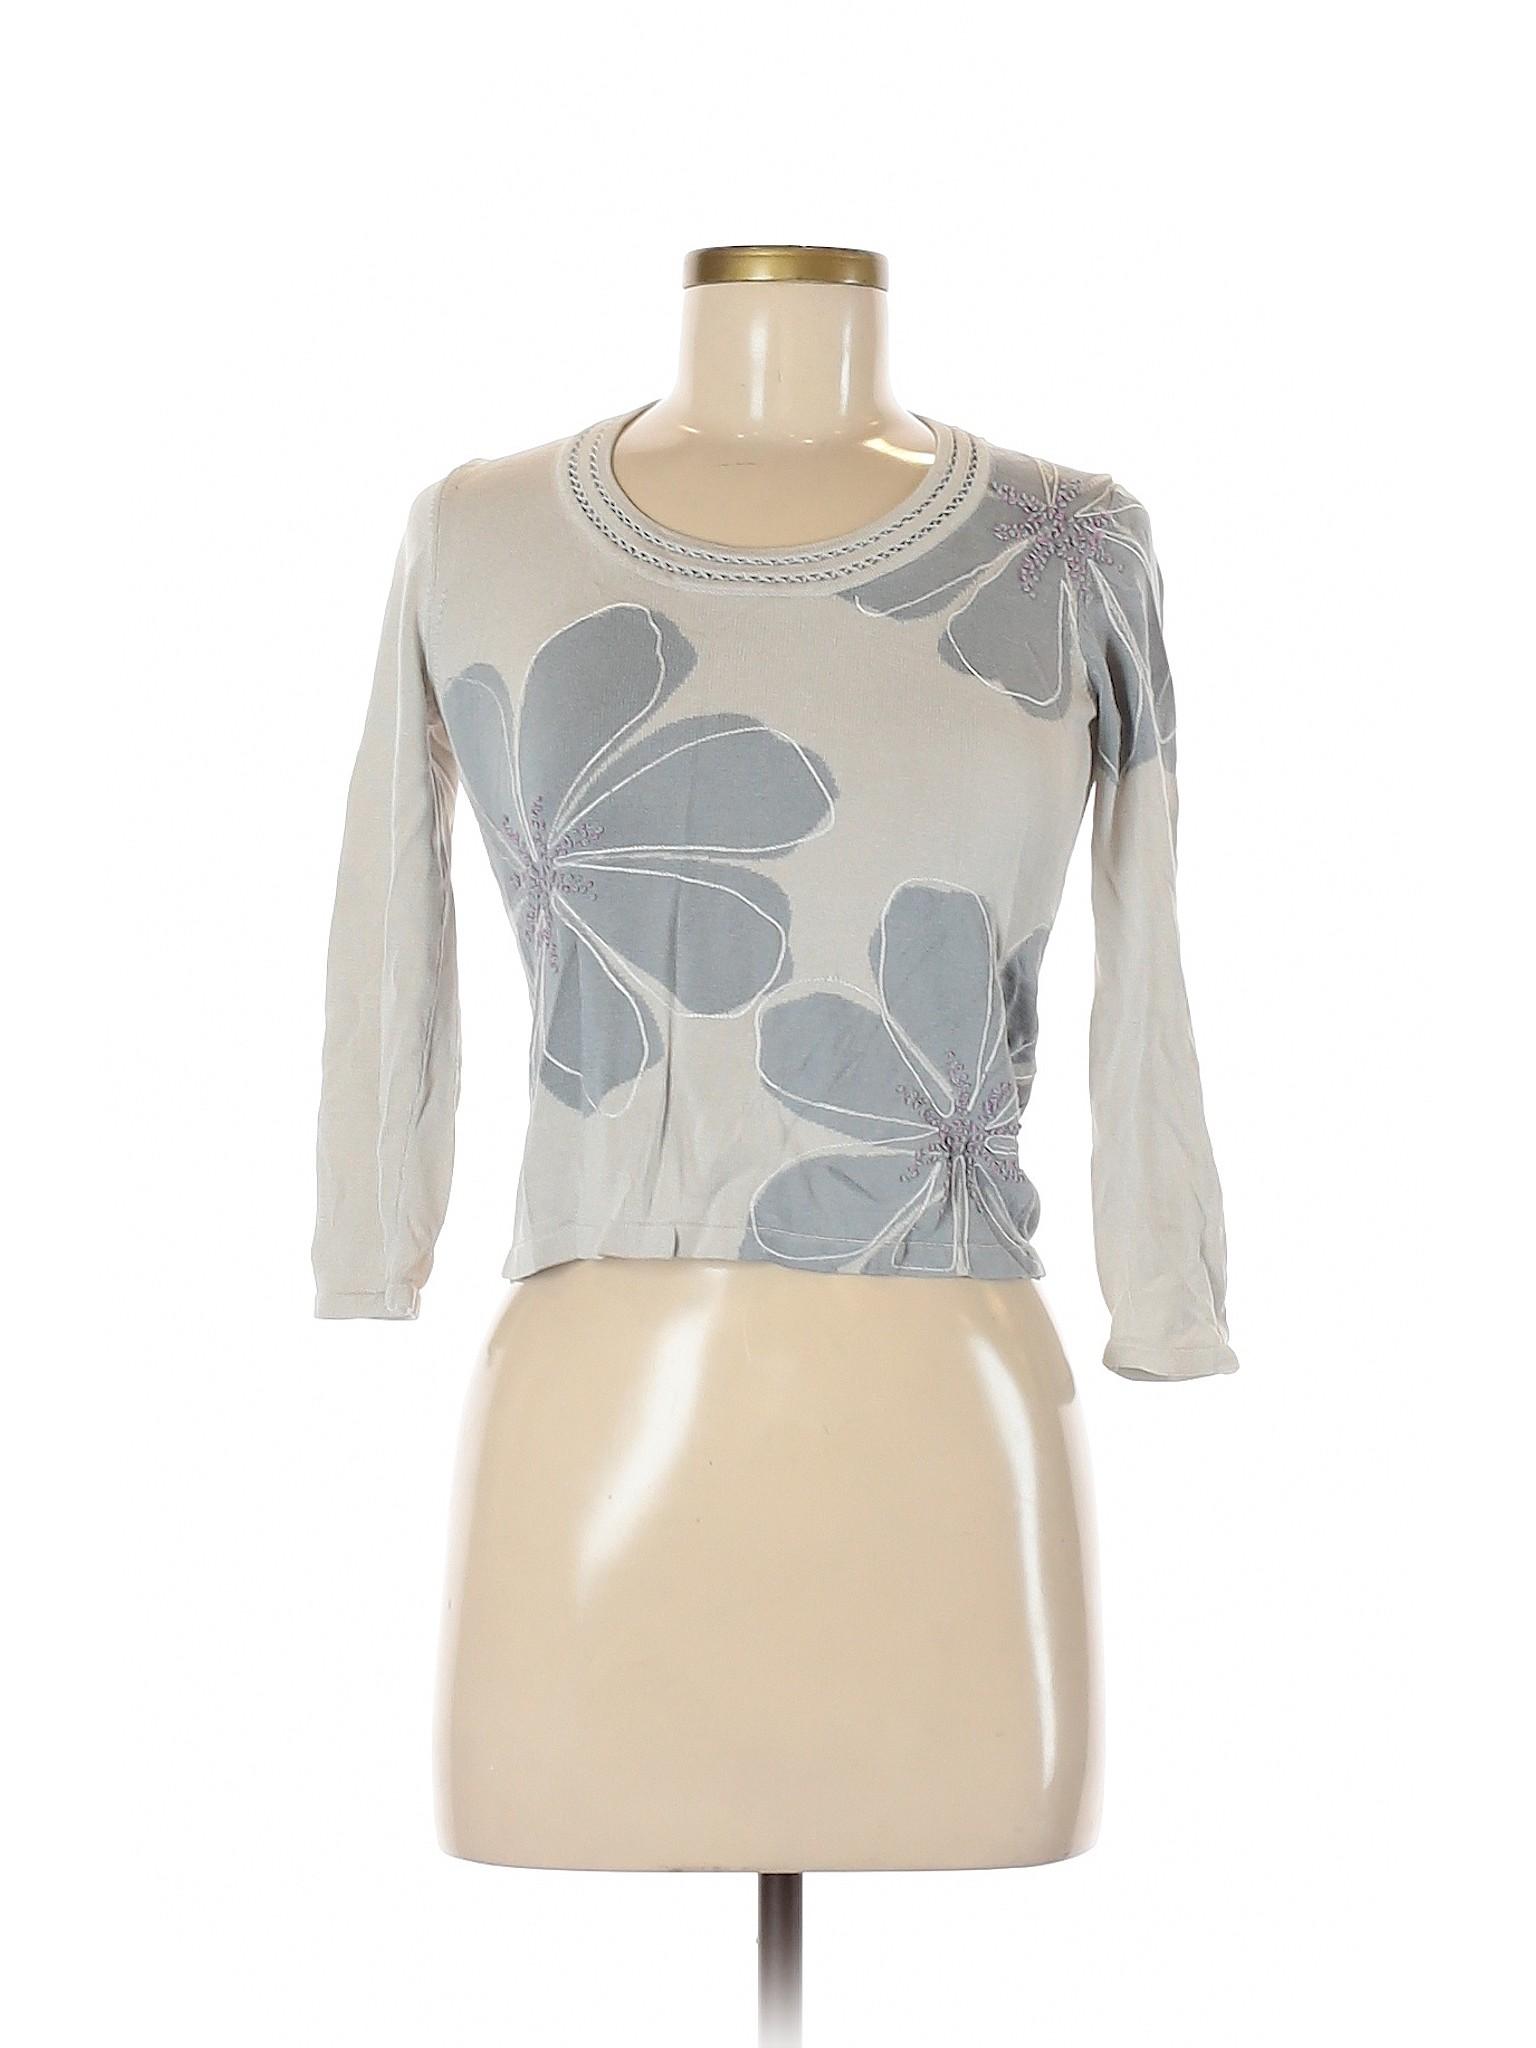 524402da16 Sigrid Olsen Women's Clothing On Sale Up To 90% Off Retail | thredUP